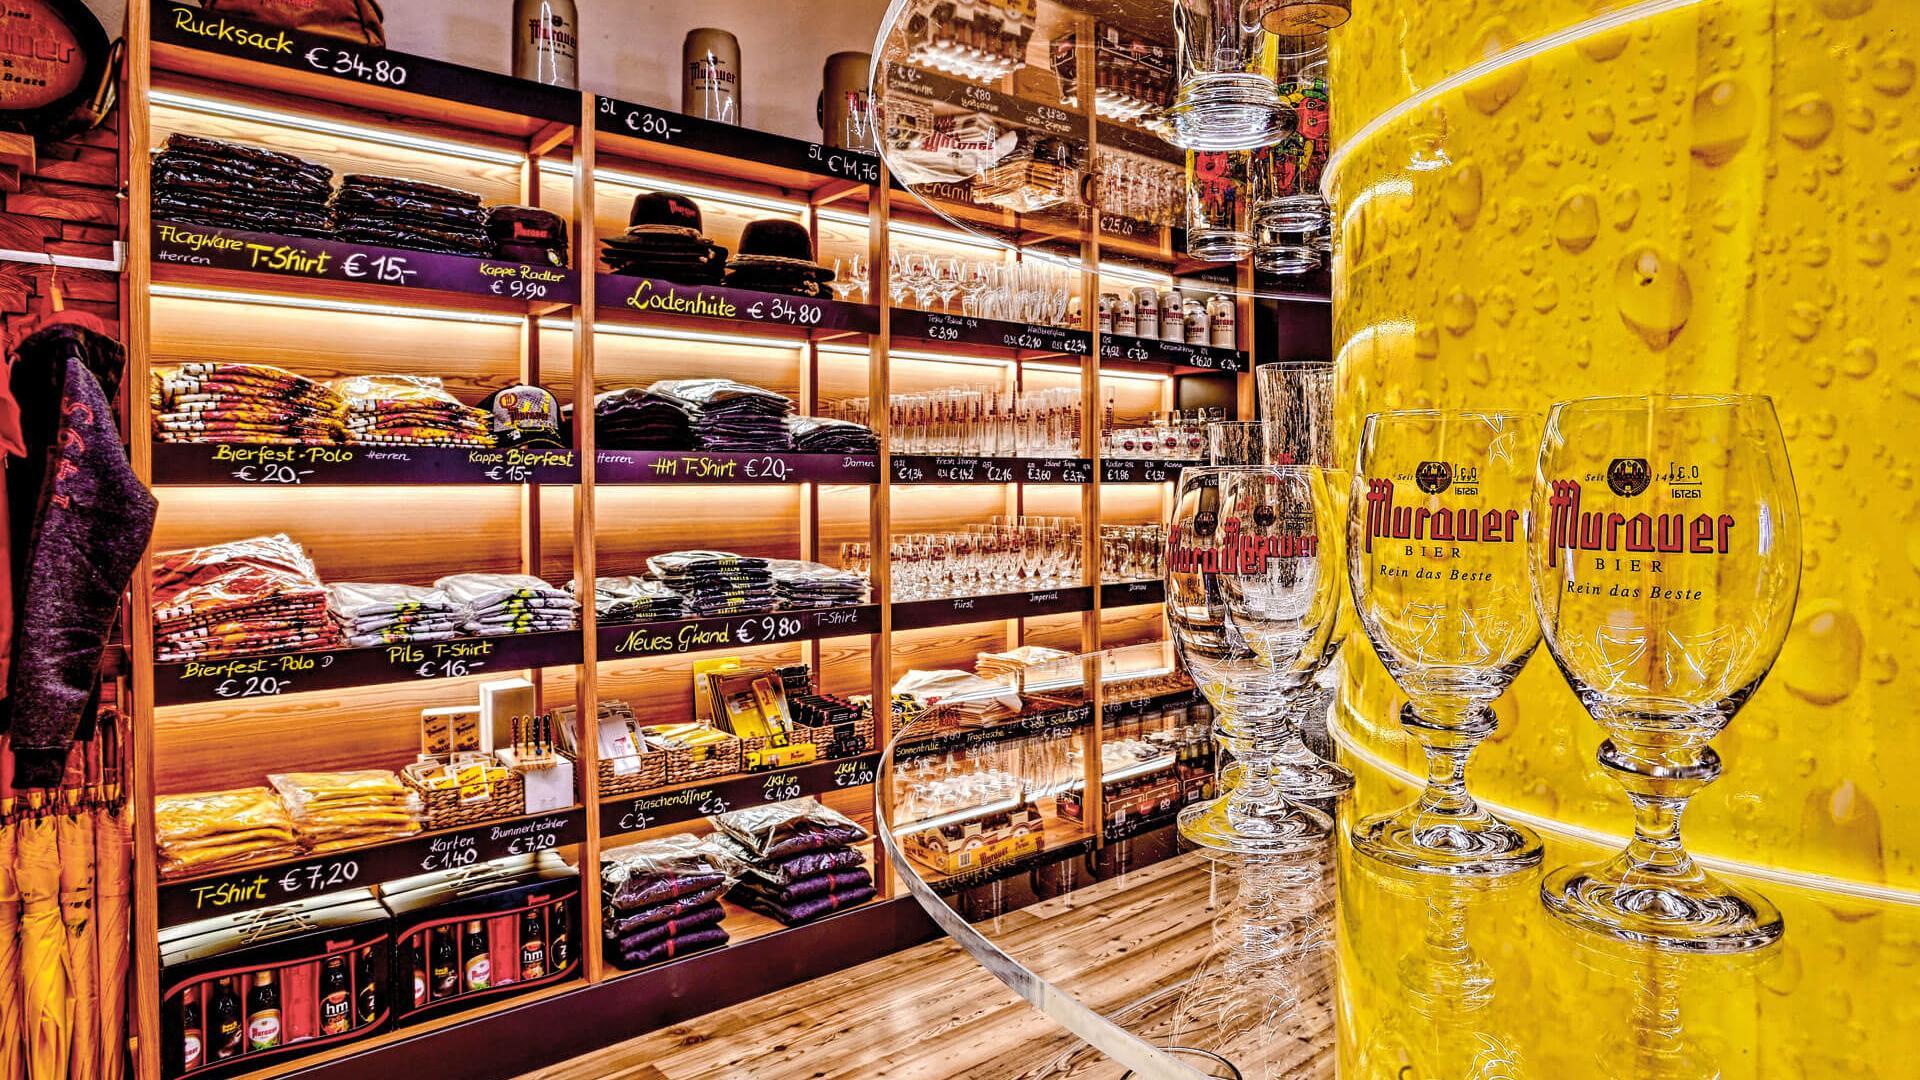 Shop Murauerbier